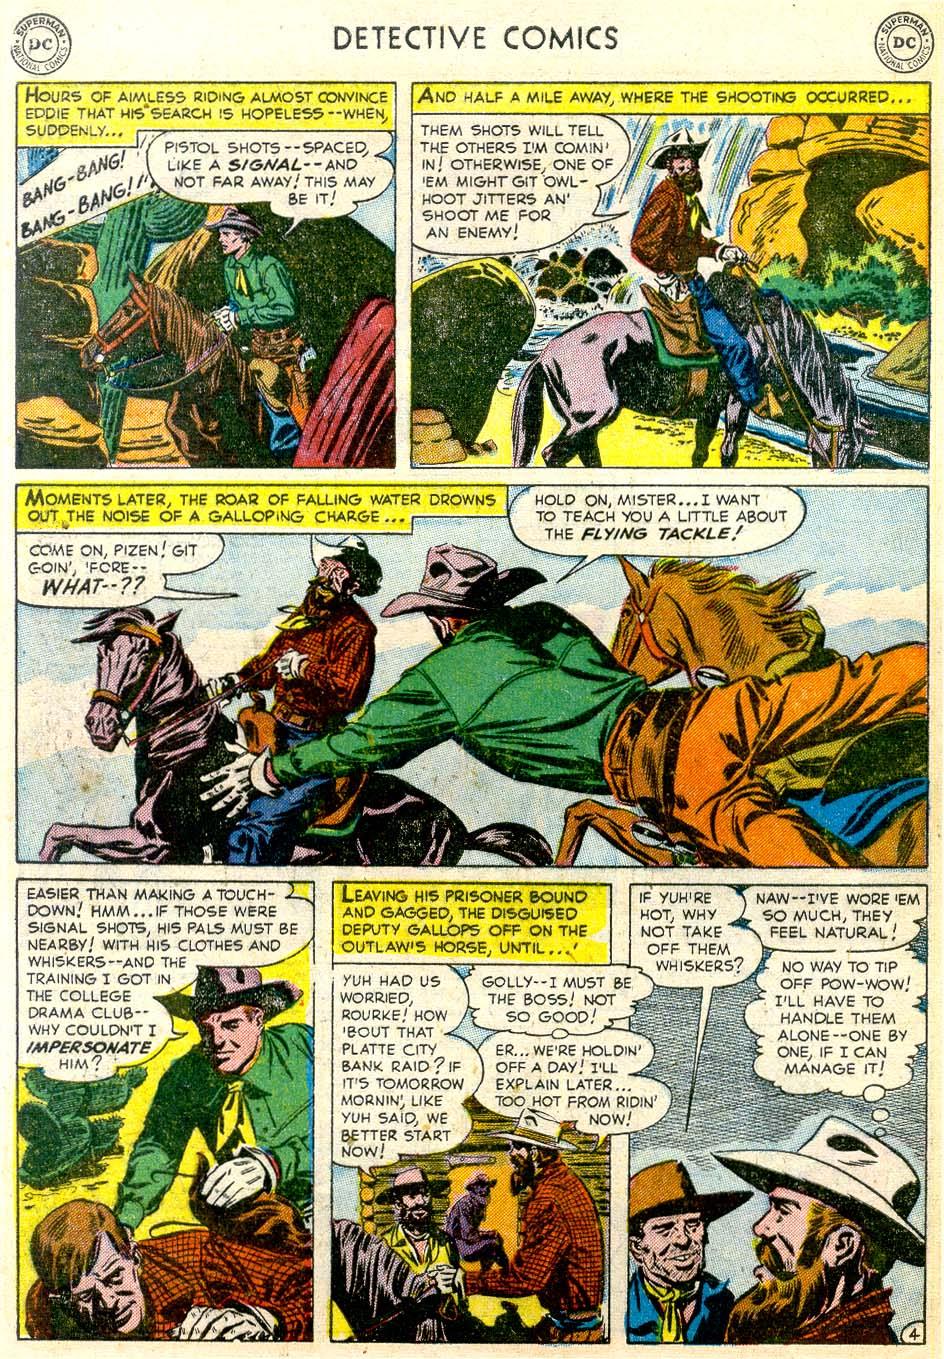 Detective Comics (1937) 178 Page 35